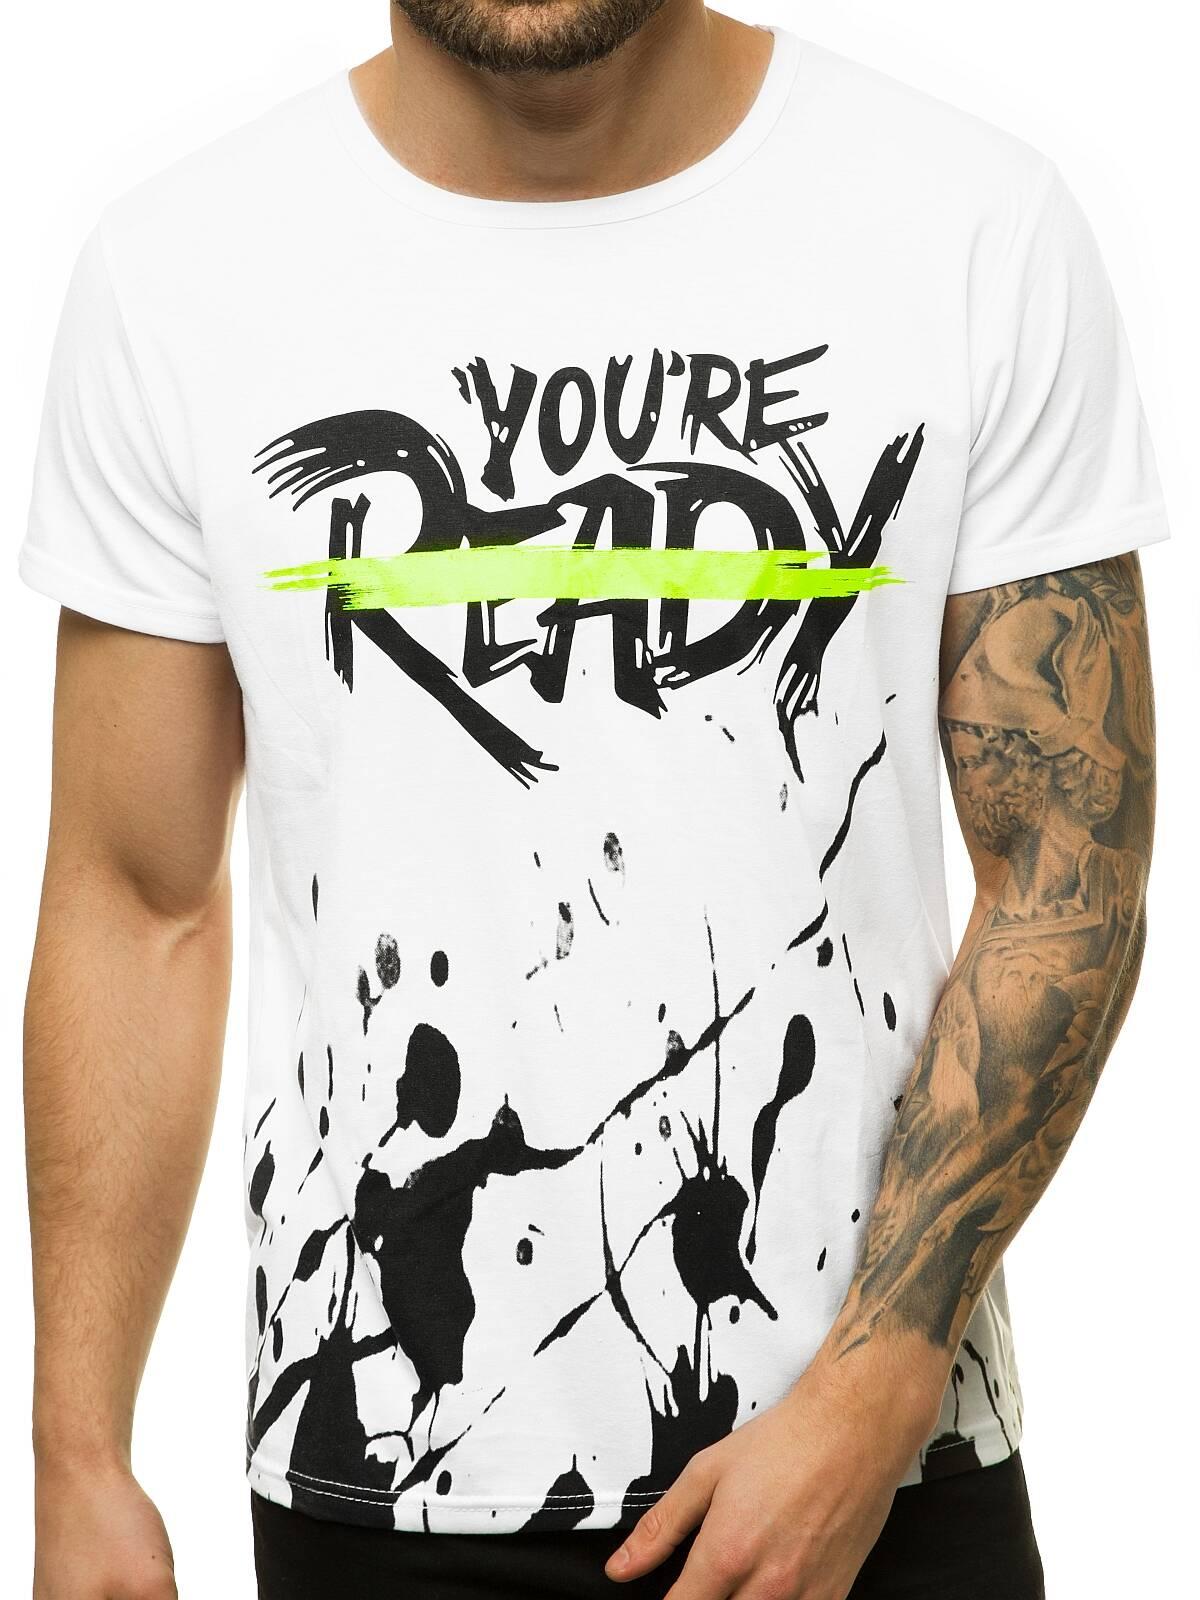 T-Shirt-Kurzarm-Shirt-Aufdruck-Figurbetont-Fitness-Herren-OZONEE-7396-MIX Indexbild 29